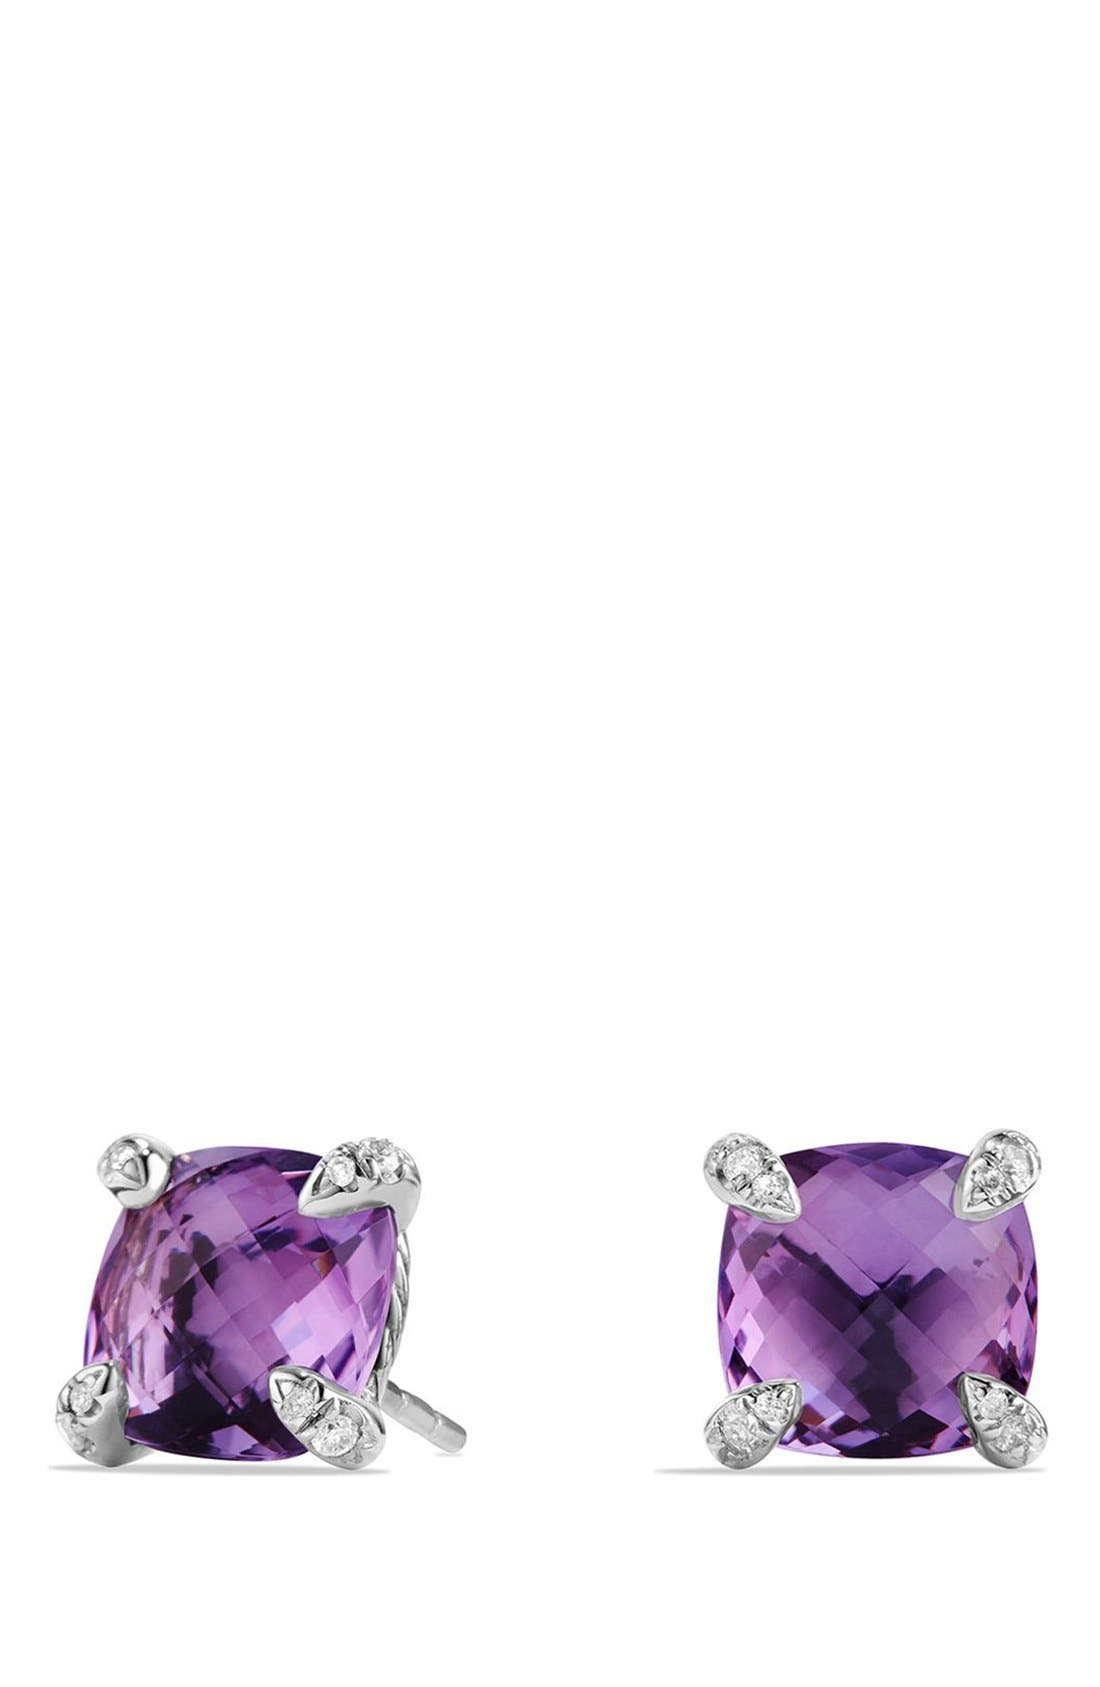 David Yurman 'Châtelaine' Earrings with Semiprecious Stones and Diamonds